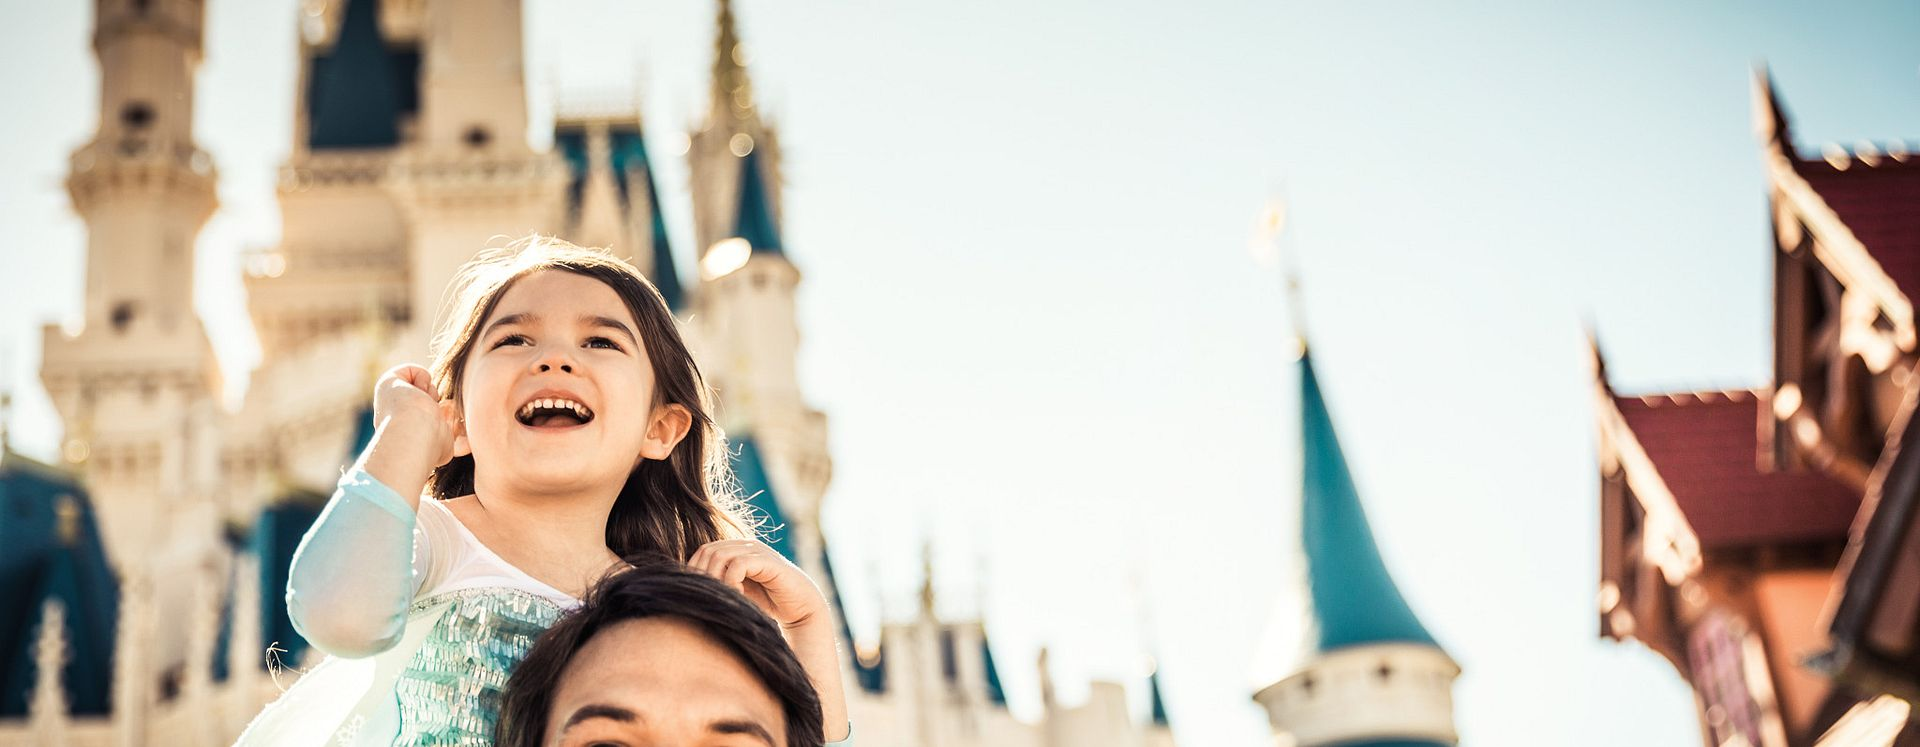 Little girl on her dad's shoulders